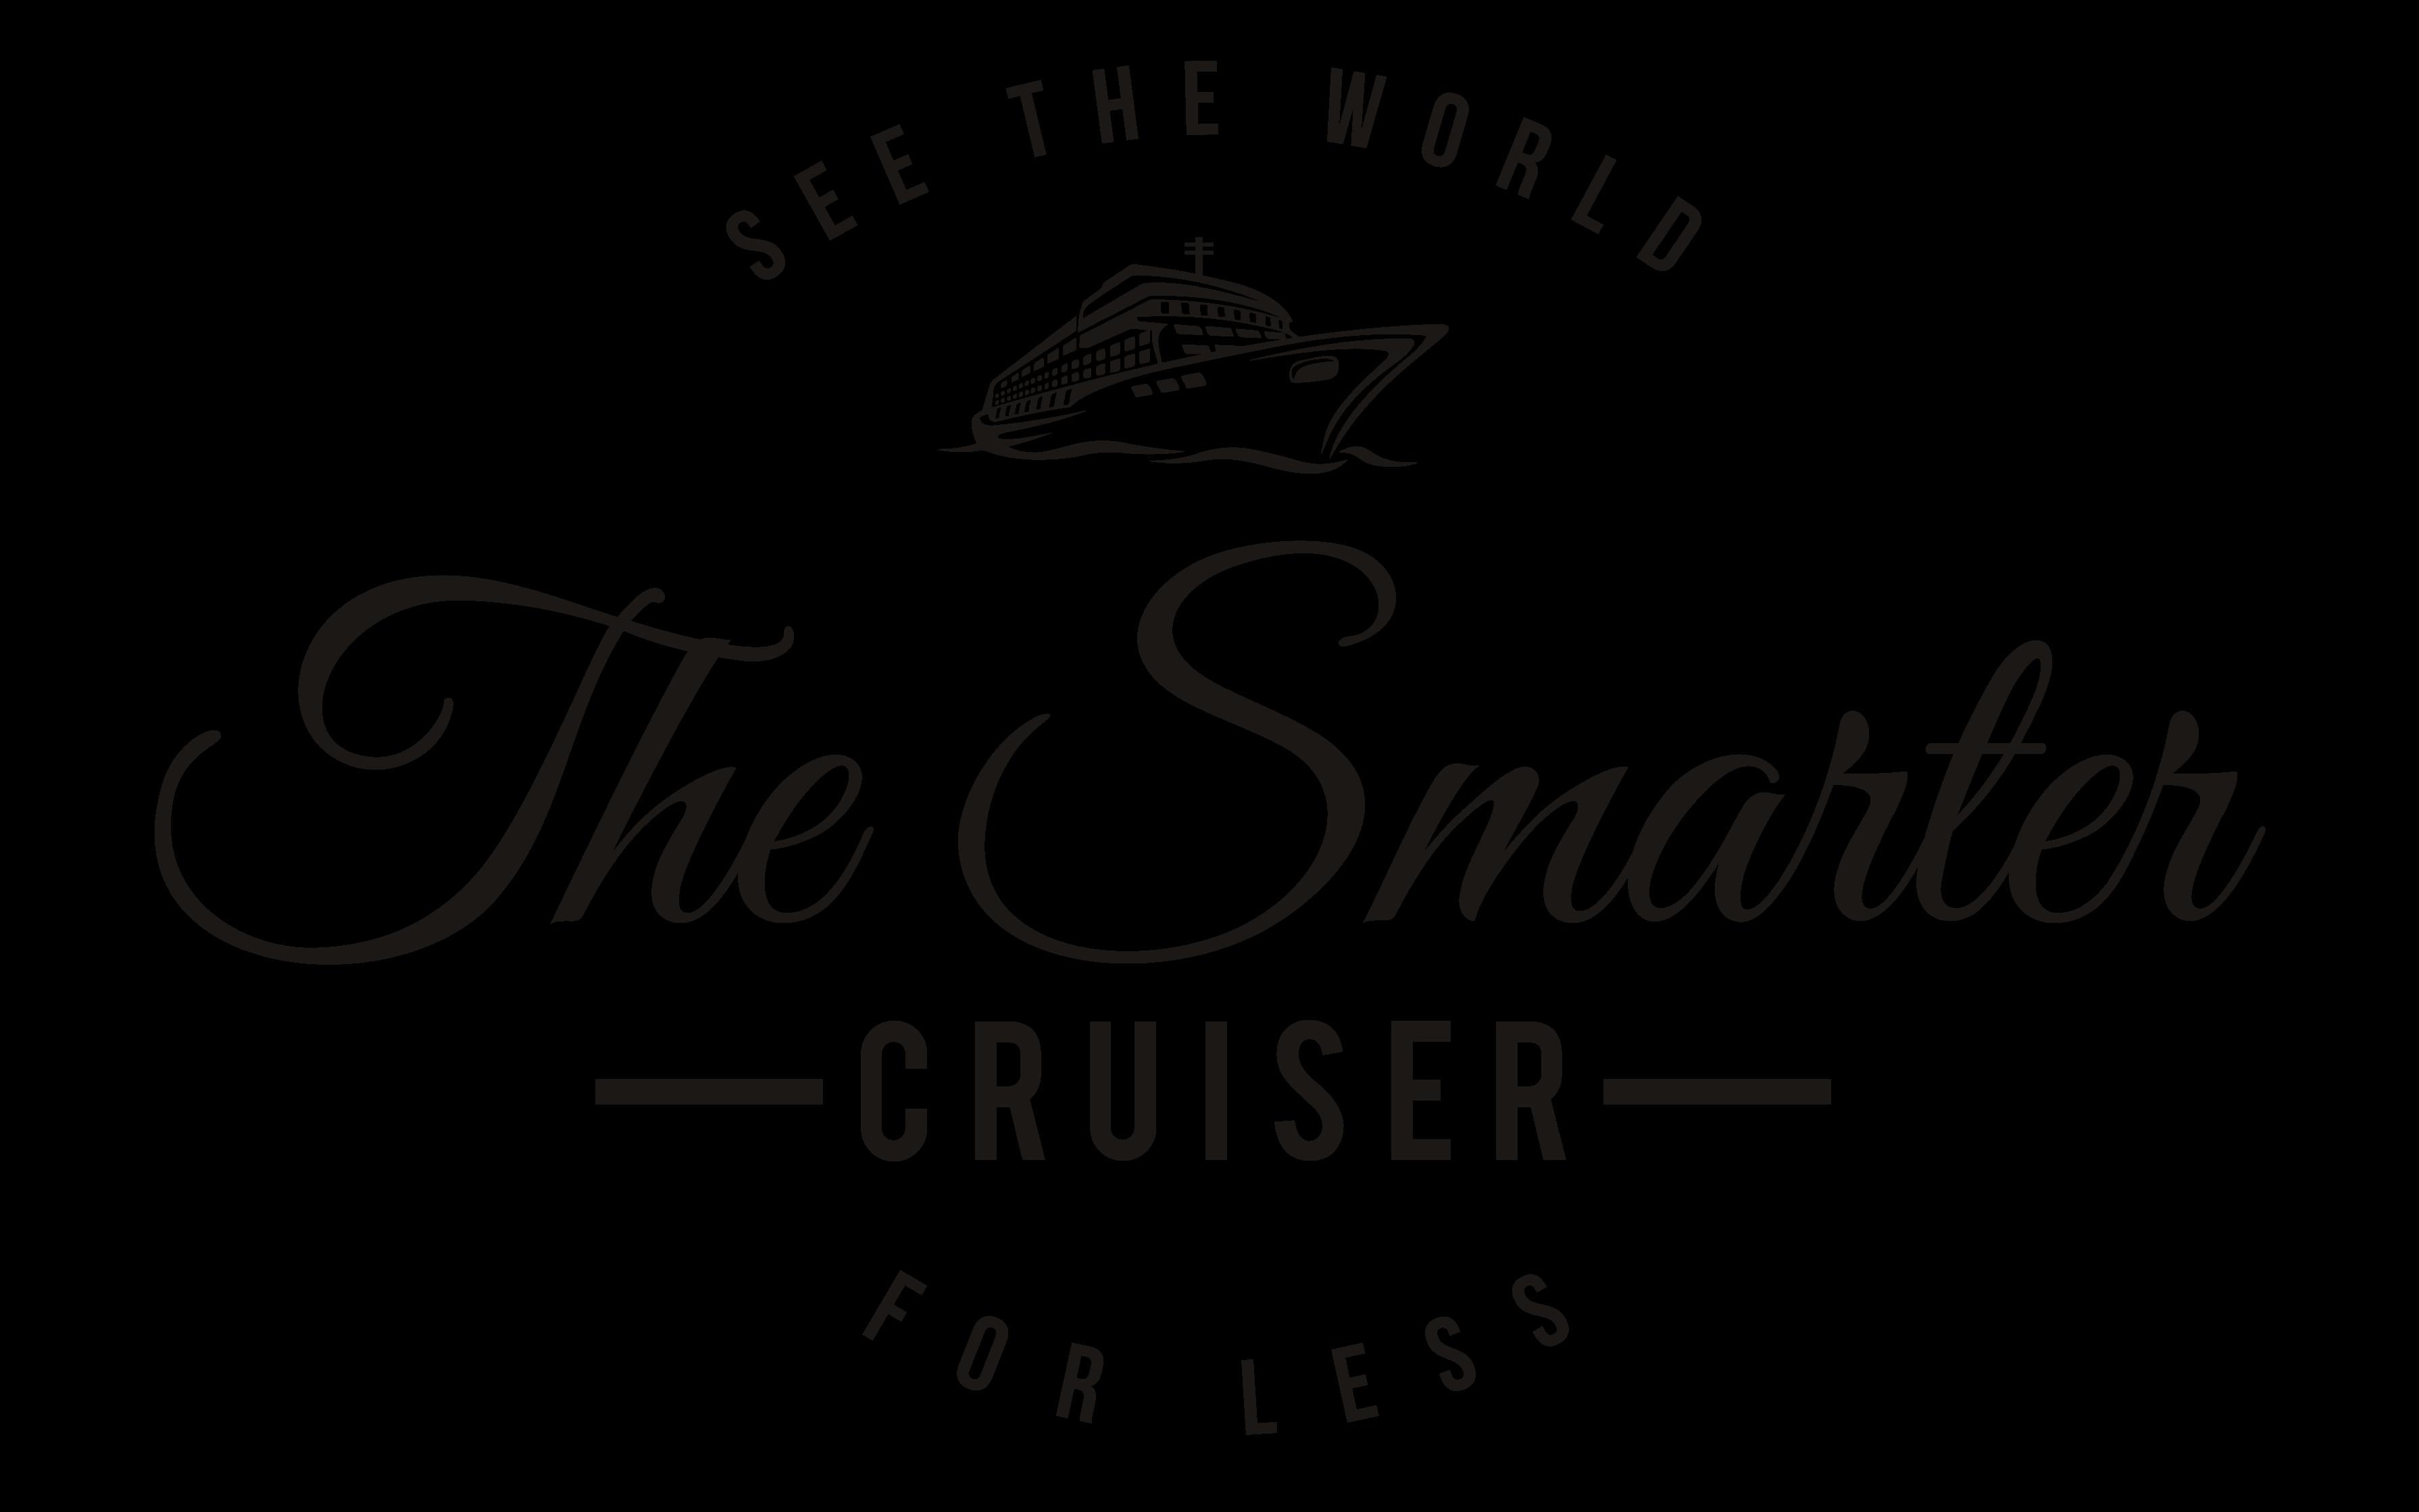 The Smarter Cruiser